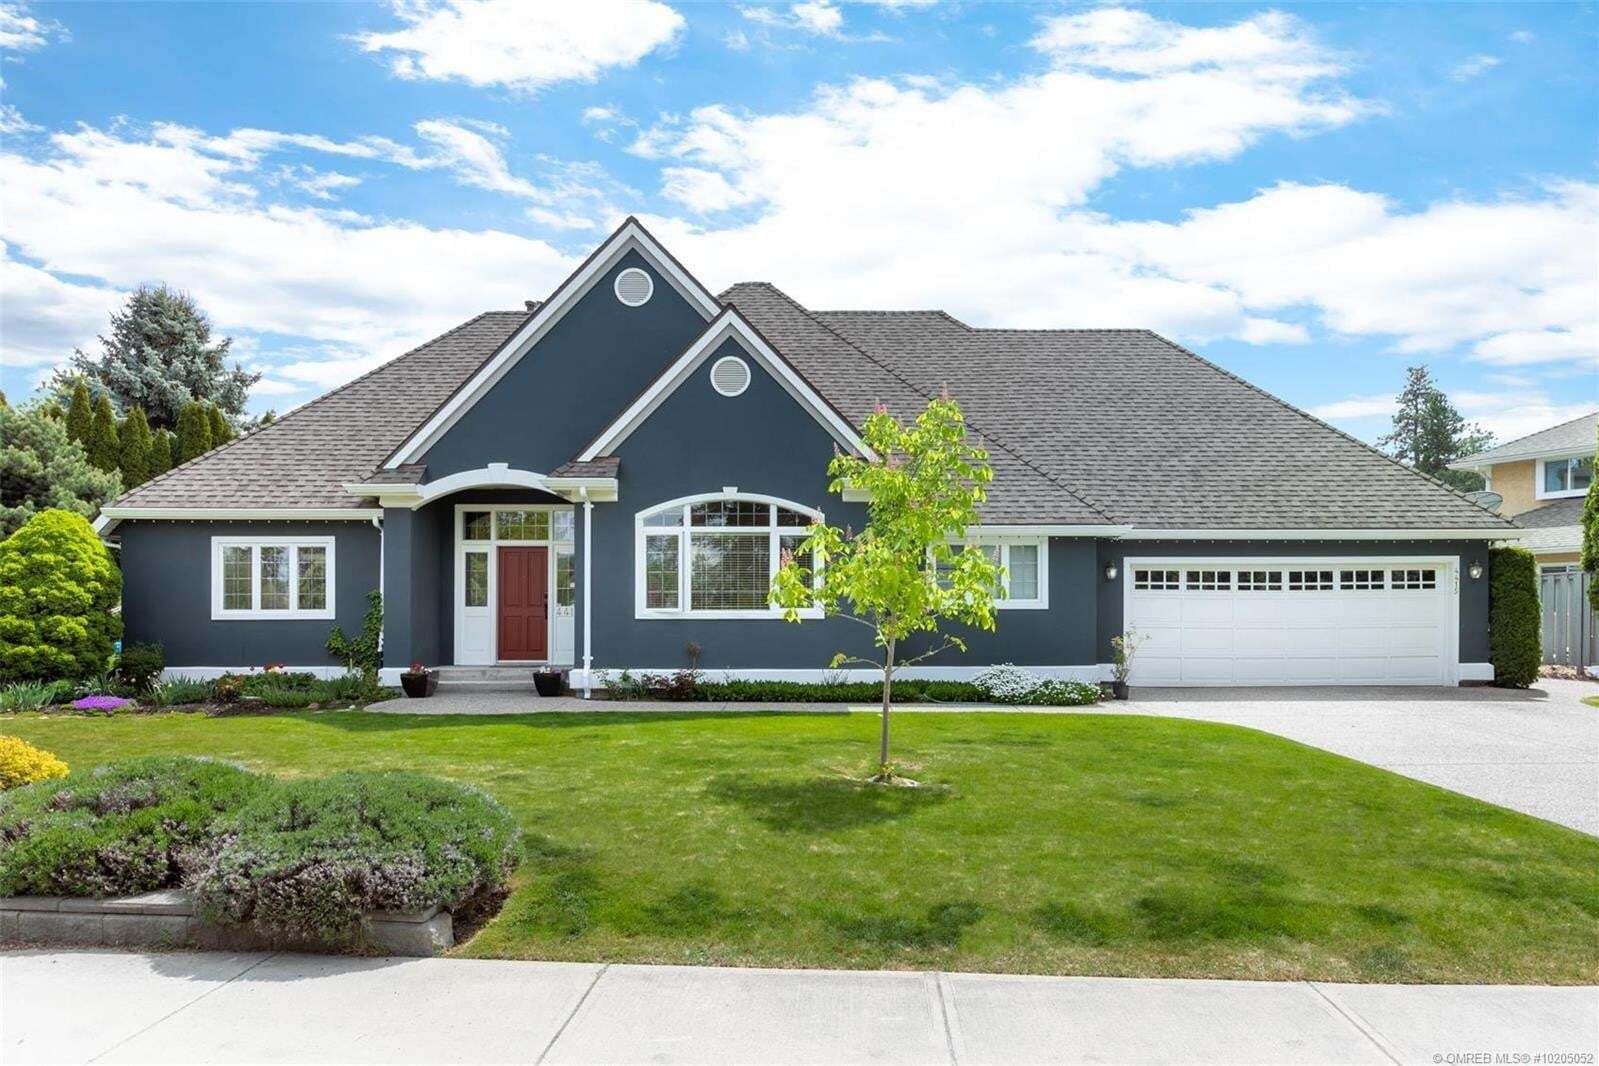 House for sale at 4415 Swaisland Rd Kelowna British Columbia - MLS: 10205052